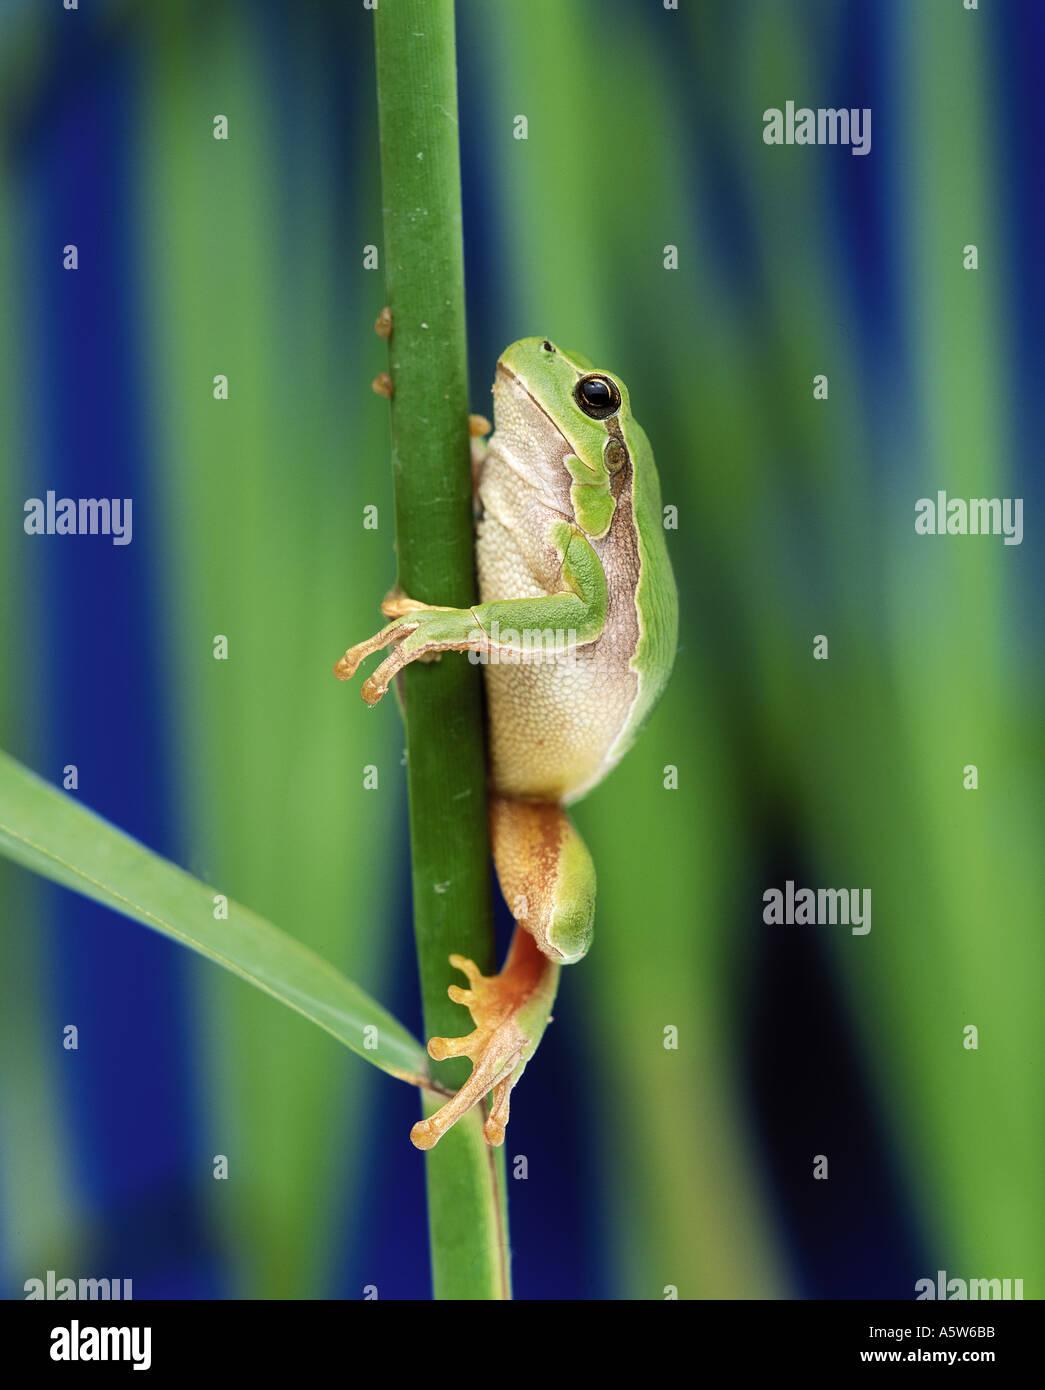 European treefrog - climbing / Hyla arborea - Stock Image